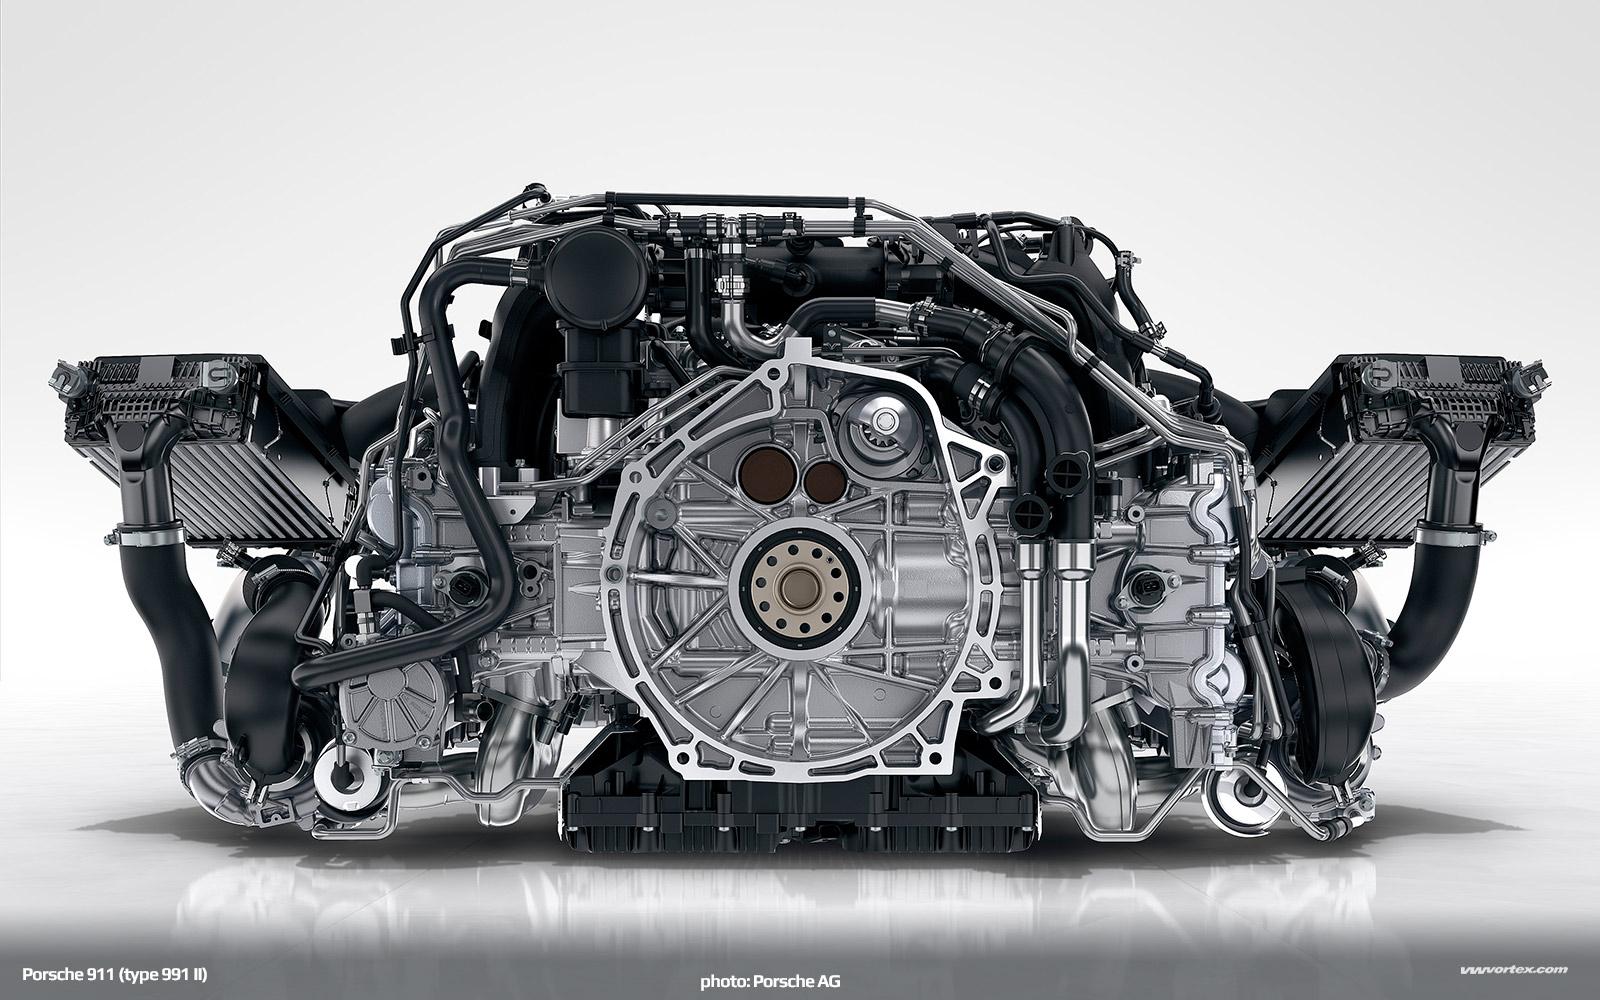 Porsche-911-991-ii-2016-500